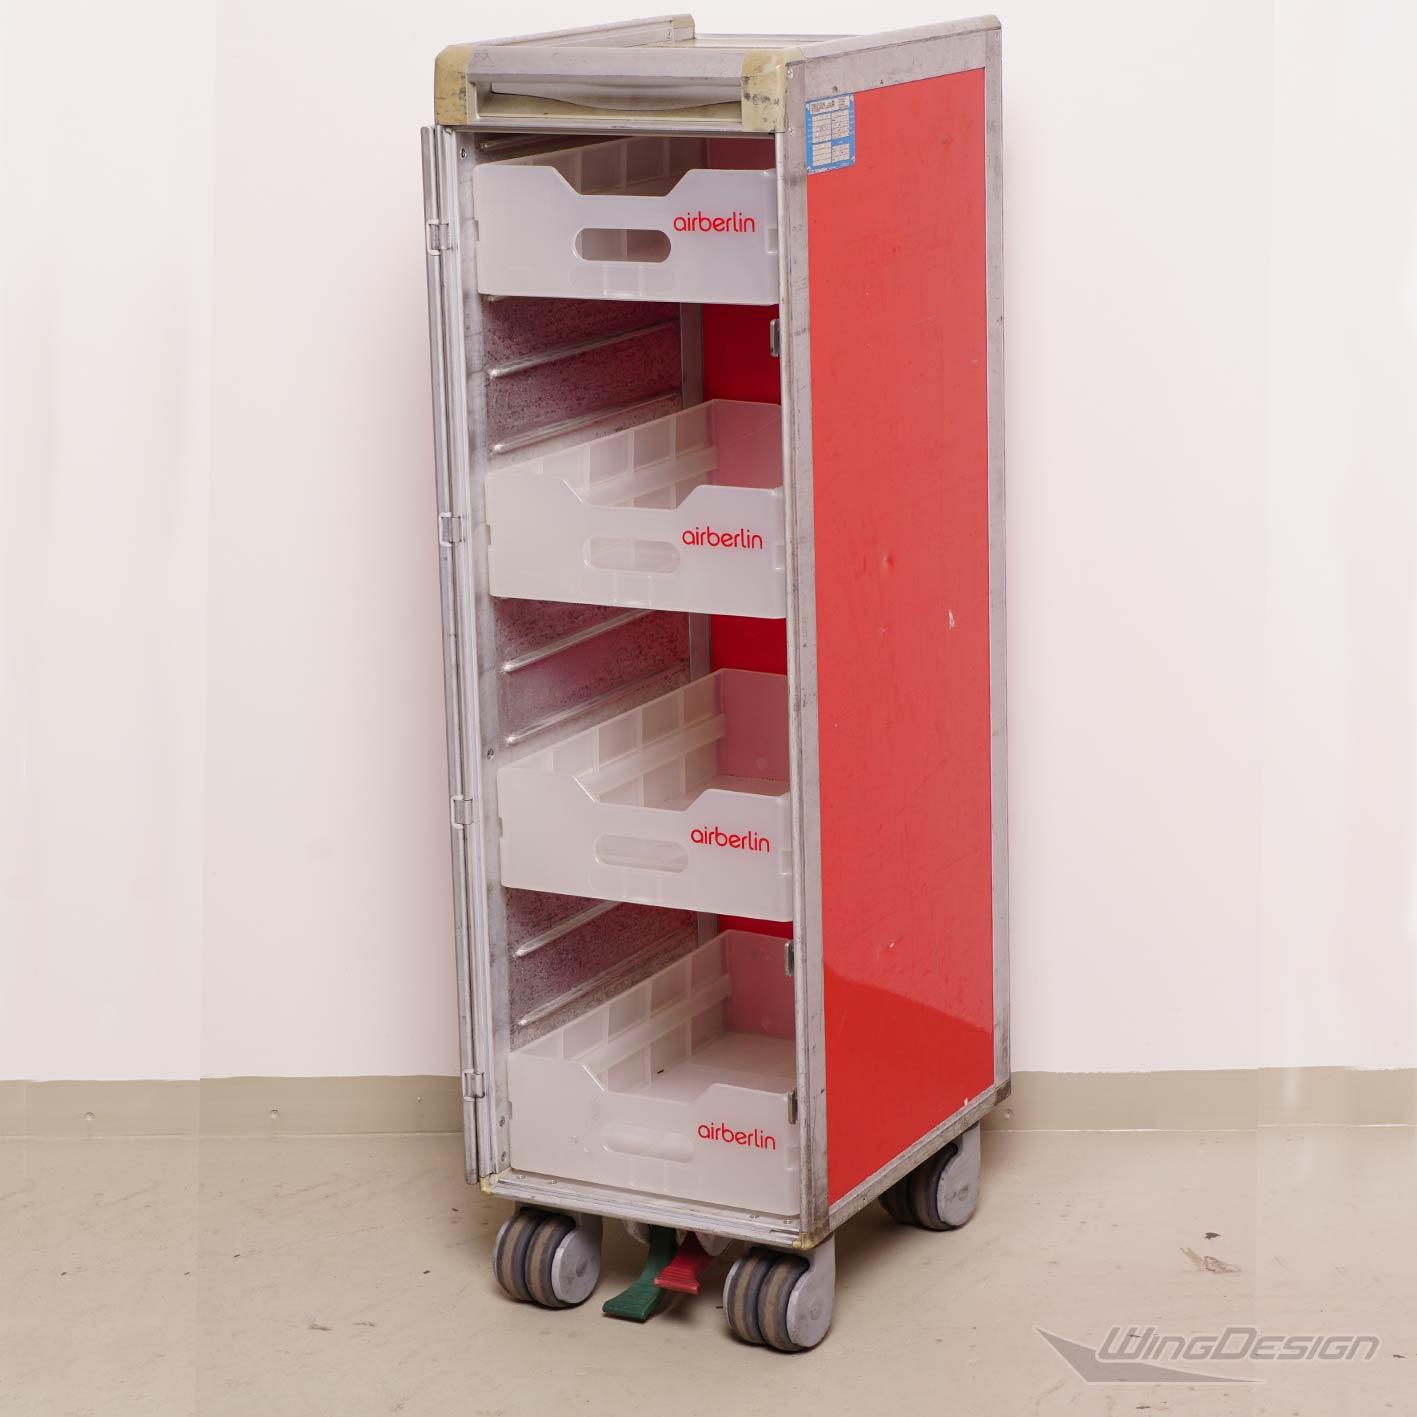 airberlin flugzeugtrolley kunststoff einschub gebraucht. Black Bedroom Furniture Sets. Home Design Ideas